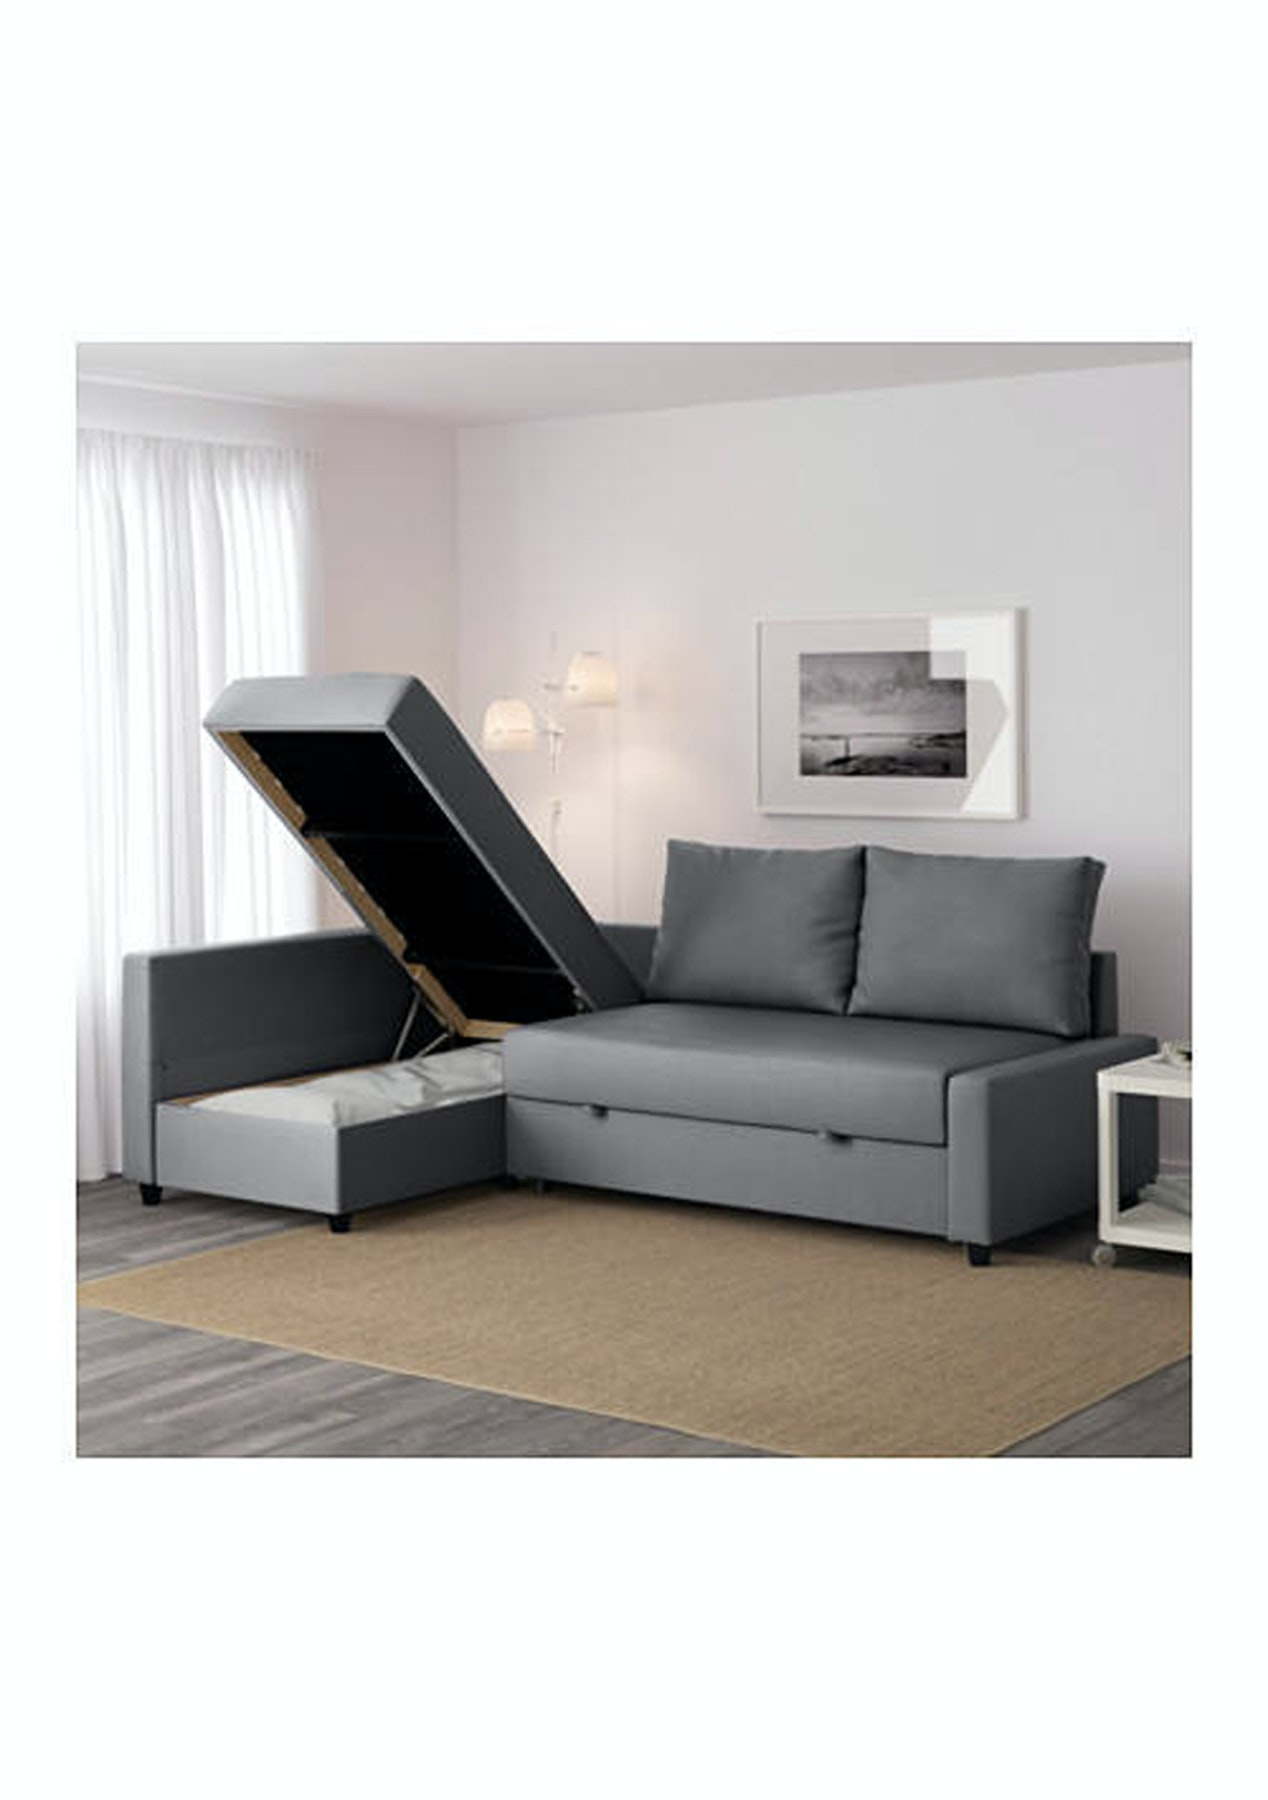 Strange Ikea Friheten Corner Sofa Bed Skiftebo Dark Grey Ibusinesslaw Wood Chair Design Ideas Ibusinesslaworg